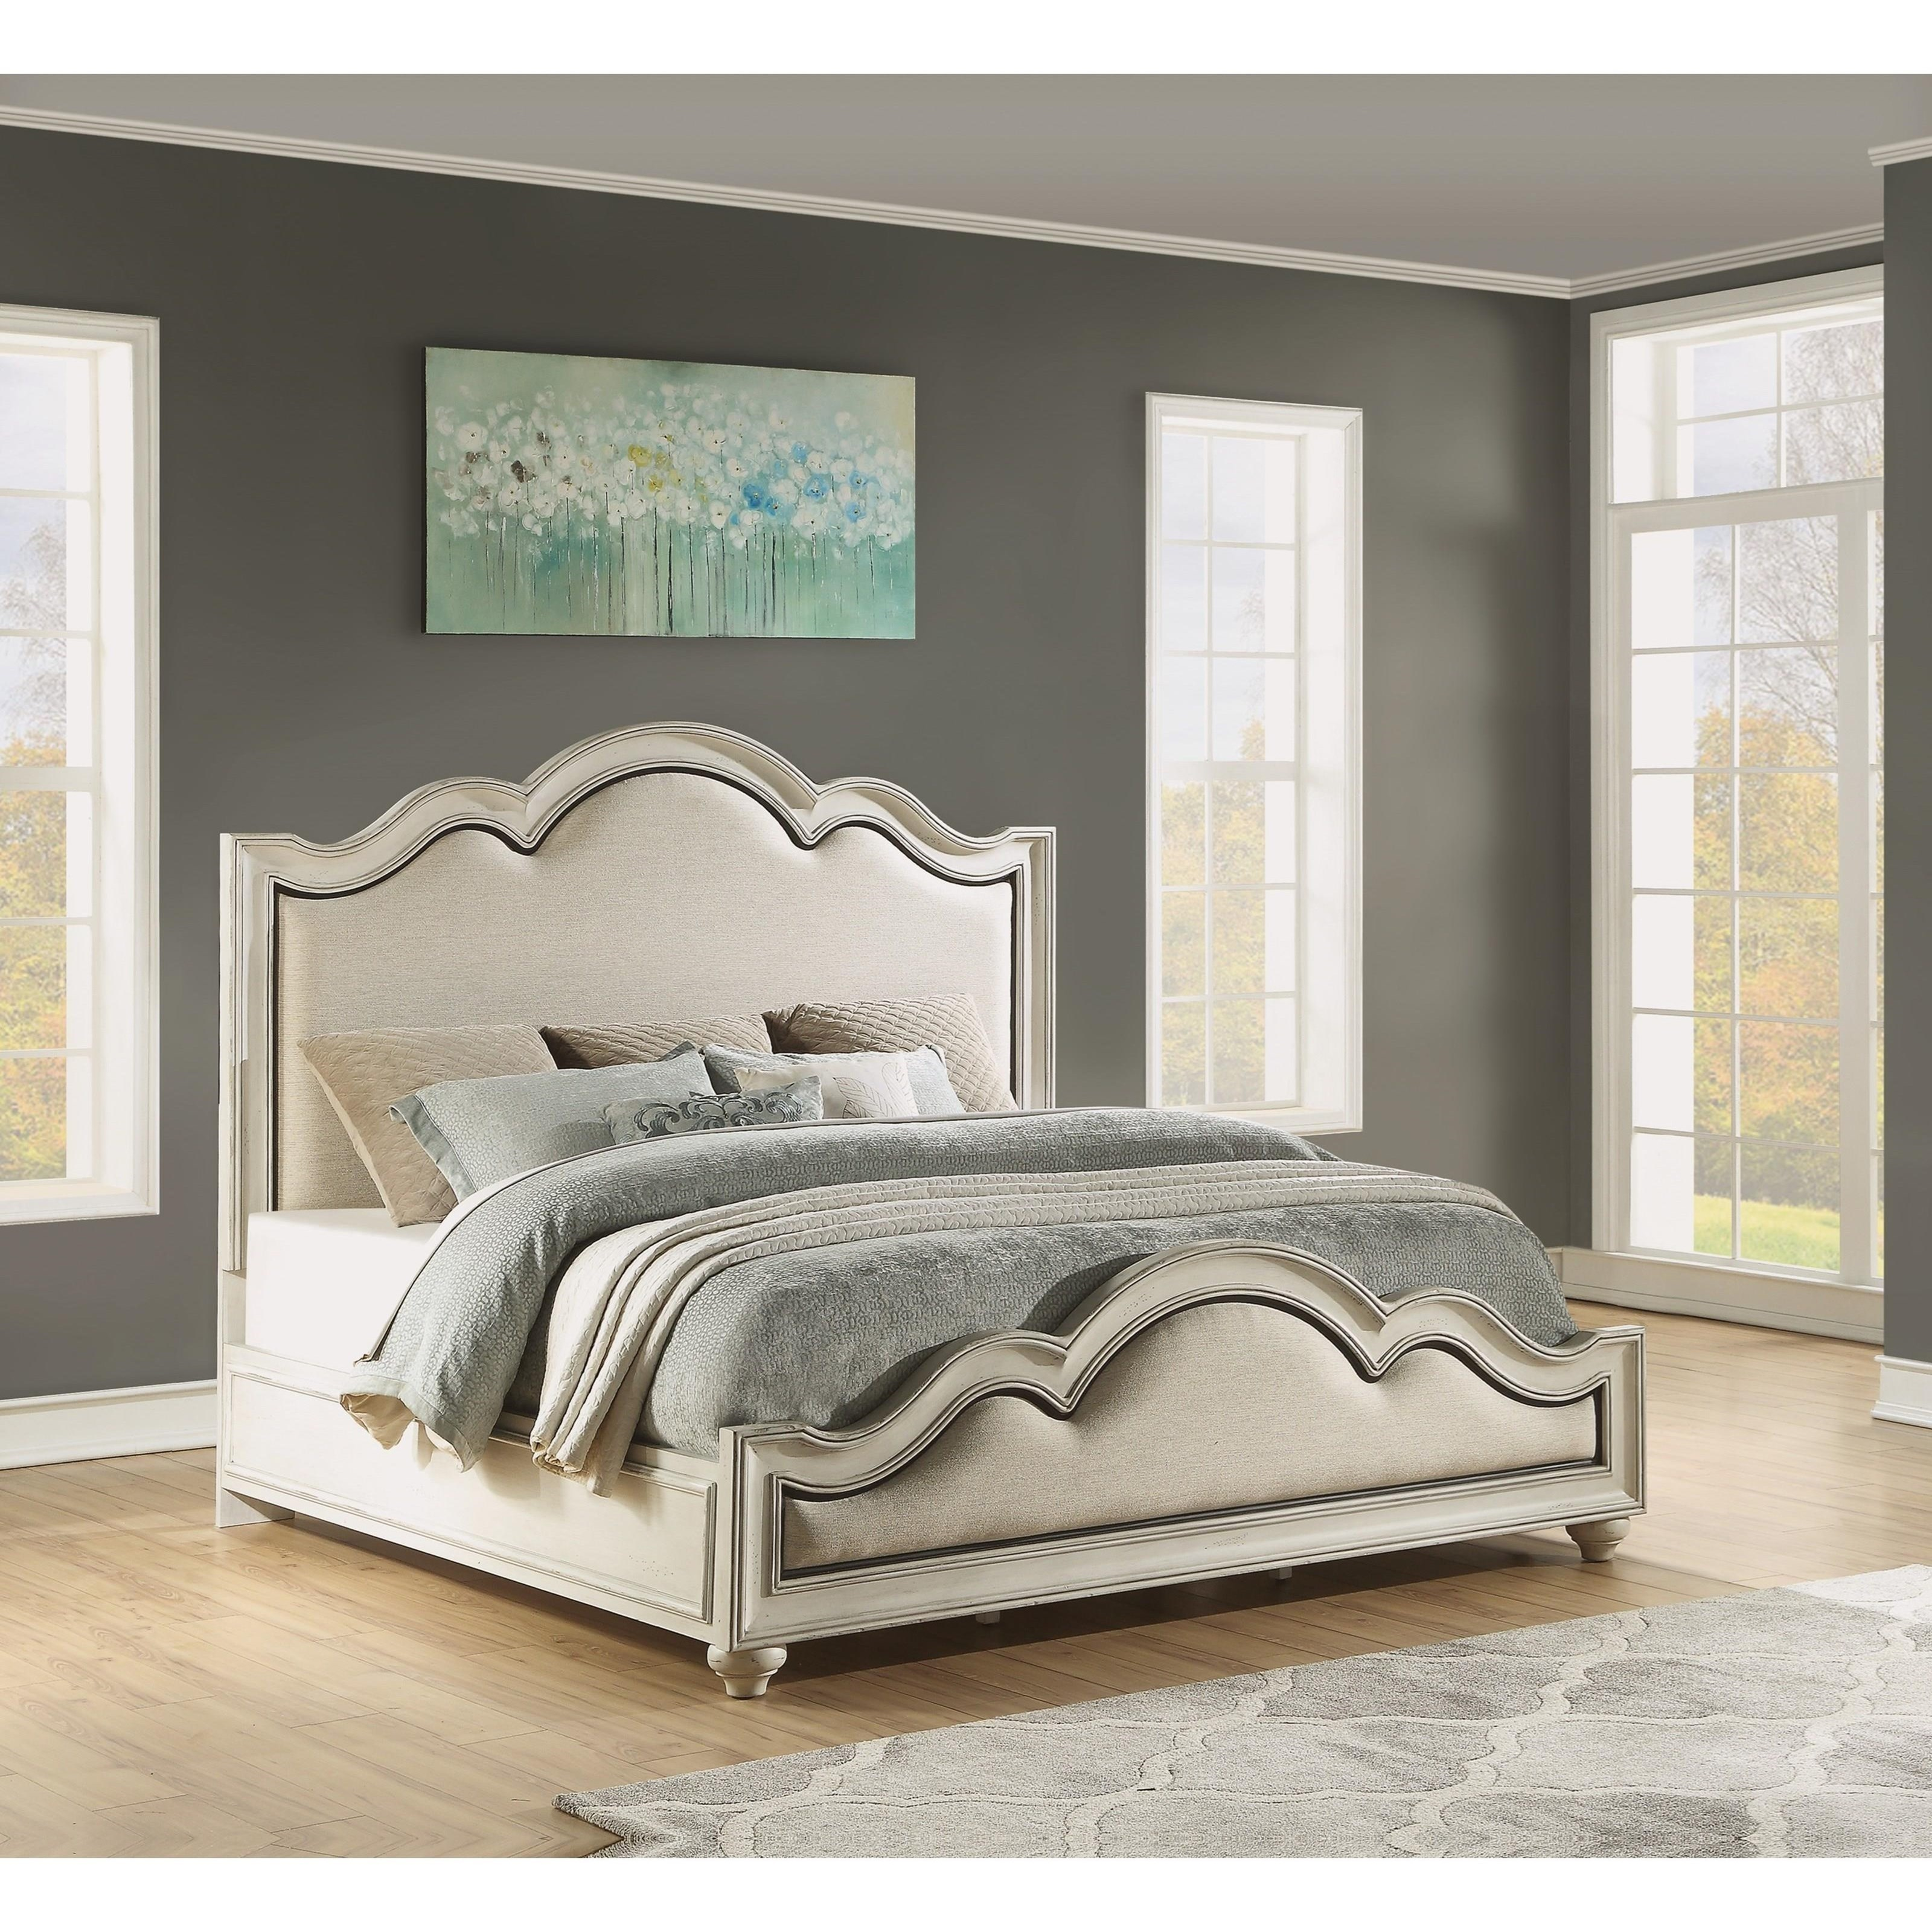 Cottage California King Upholstered Bed